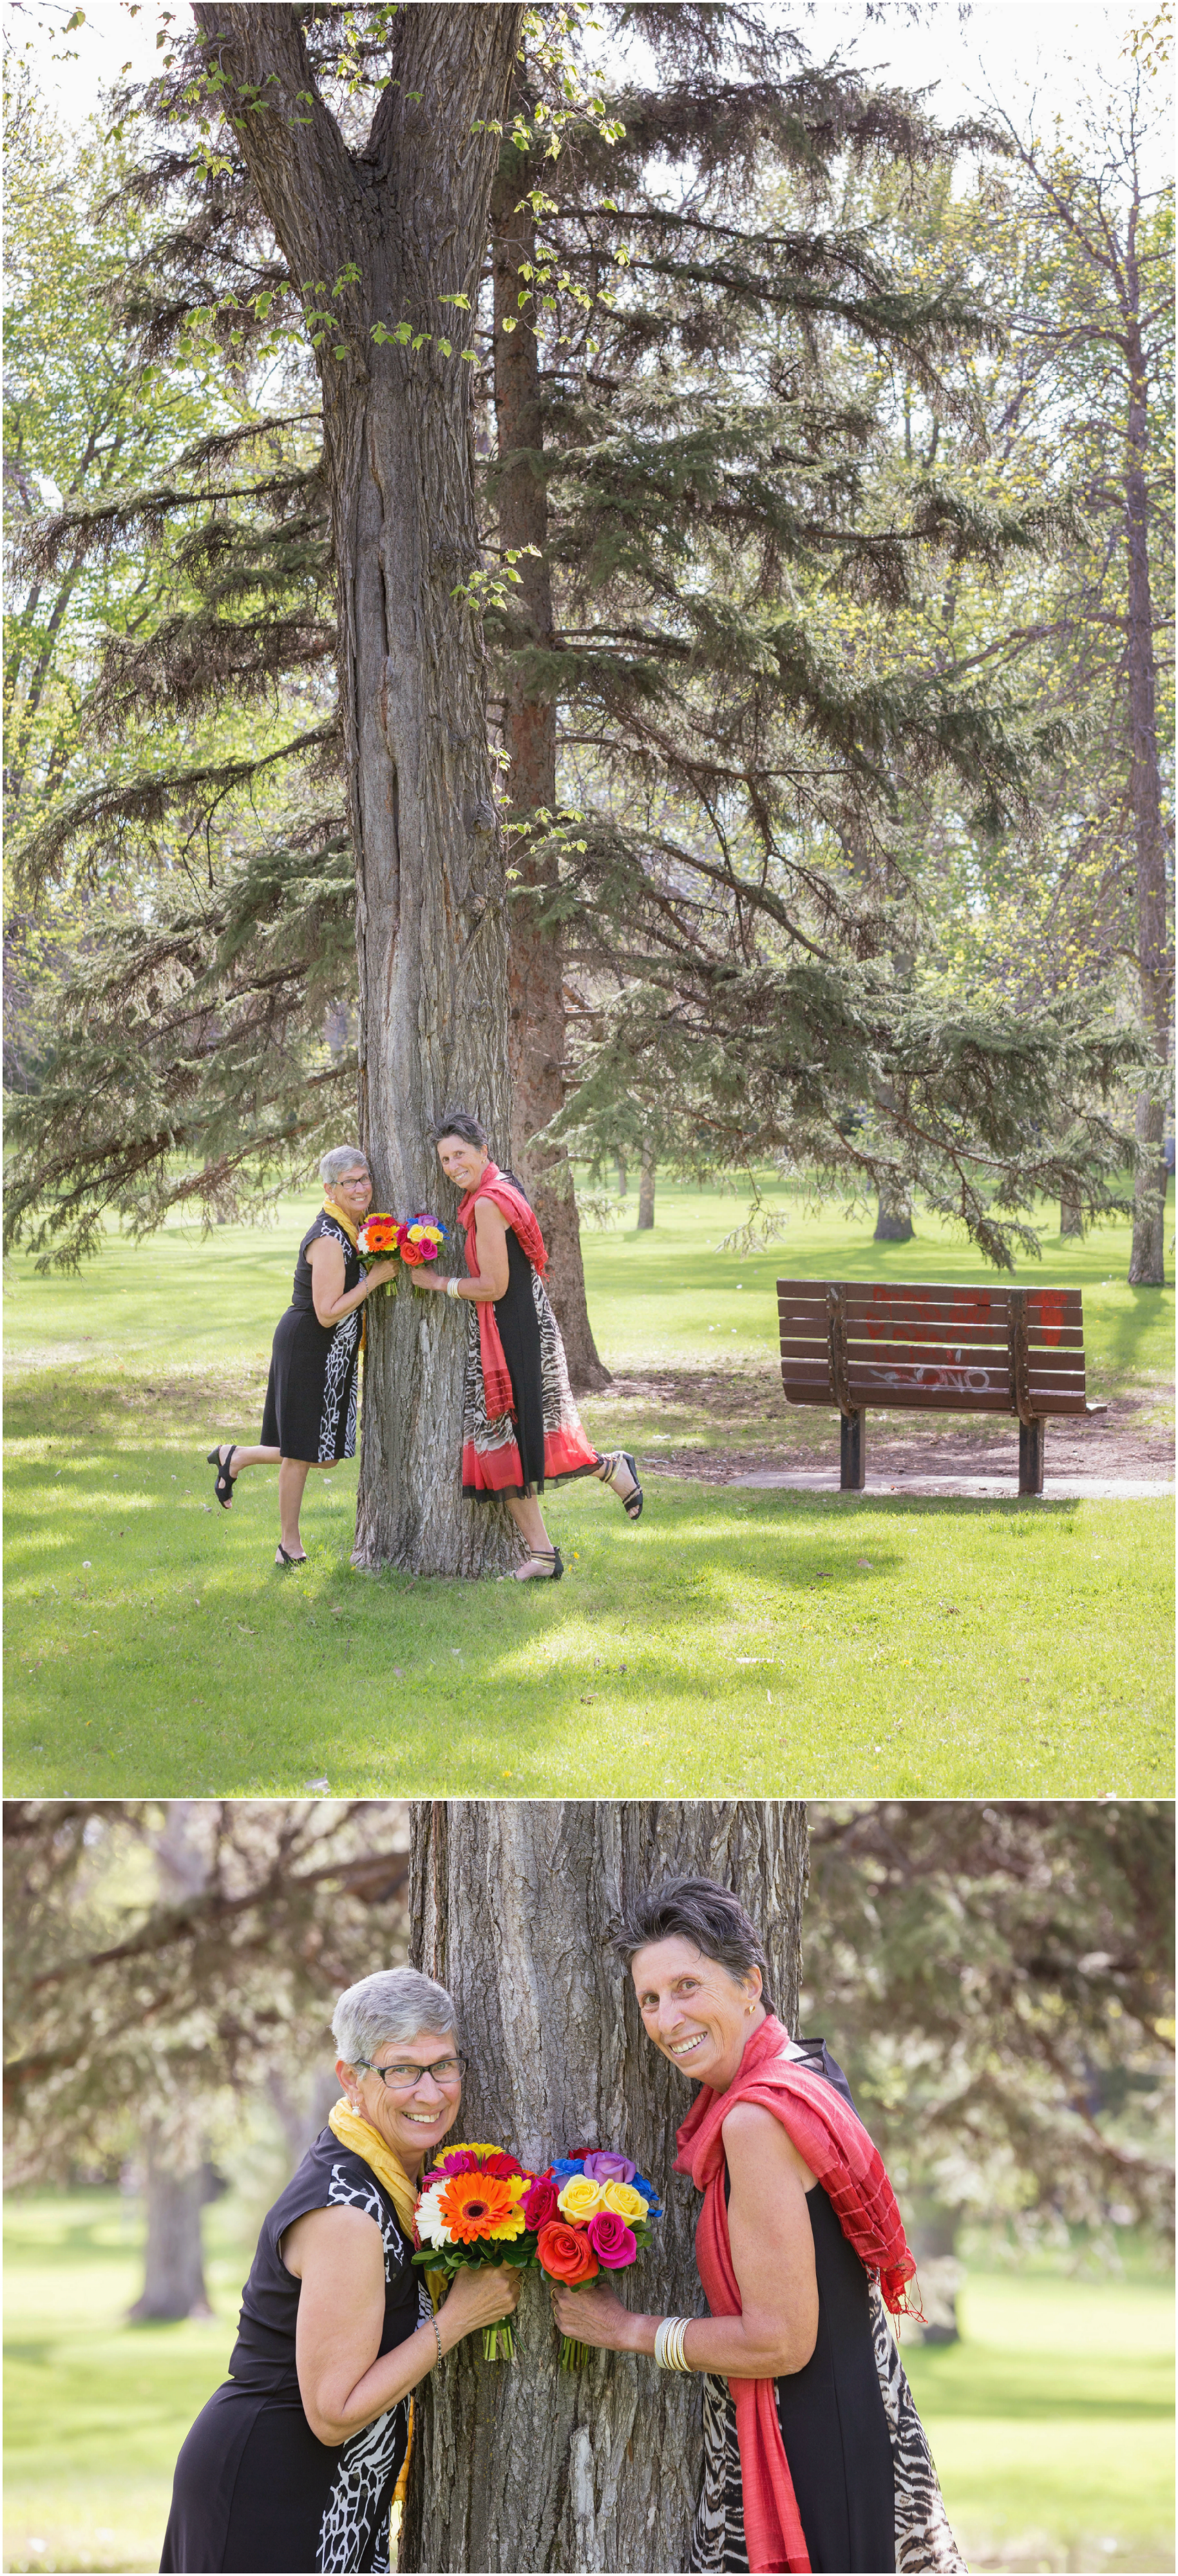 medicine_hat_backyard_wedding_7.png